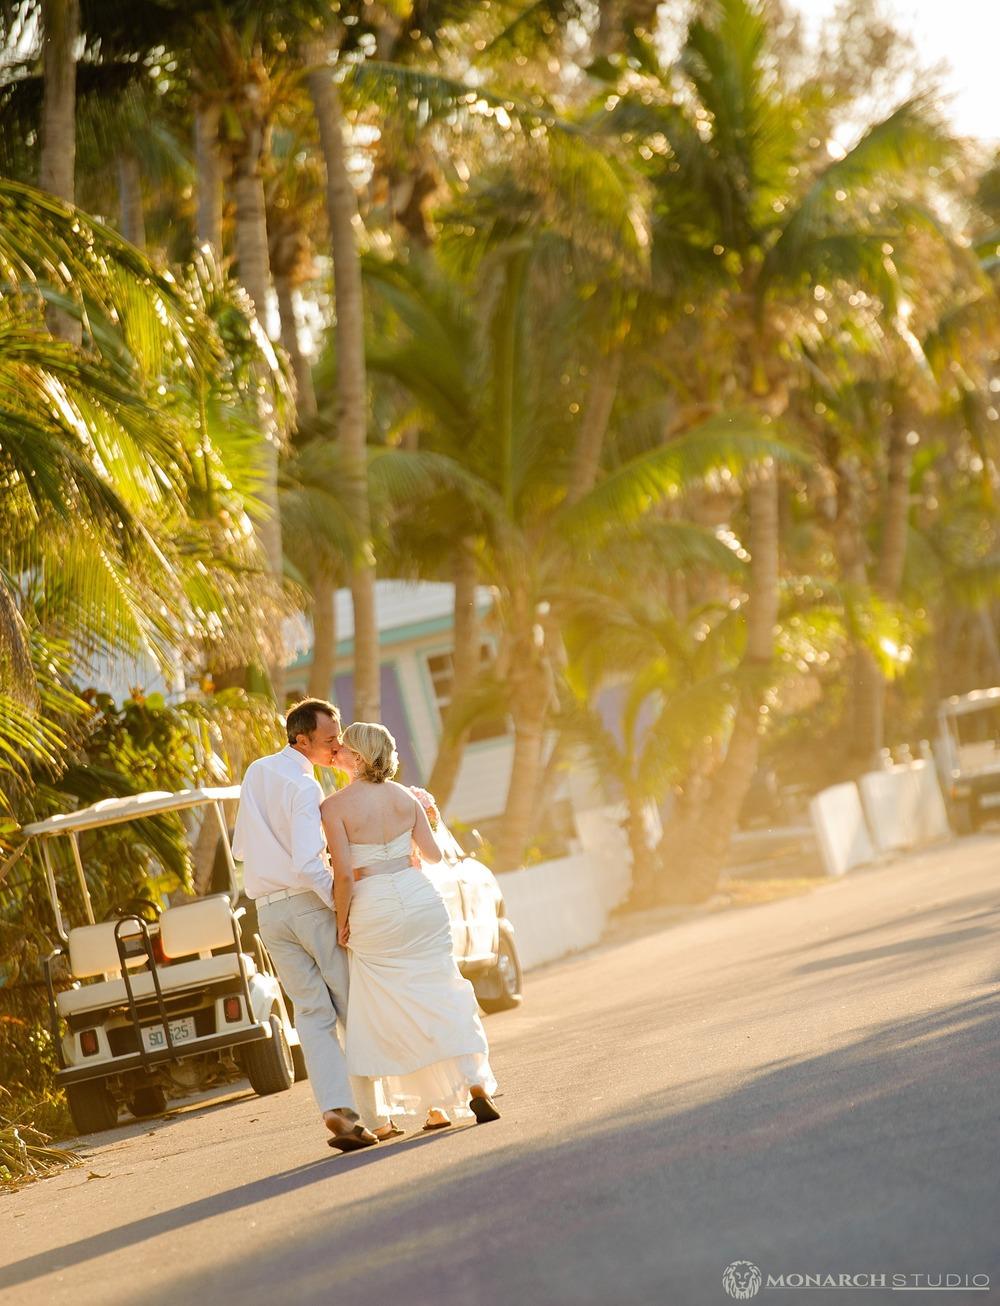 Hope-Town-Bahamas-Wedding_0039.jpg